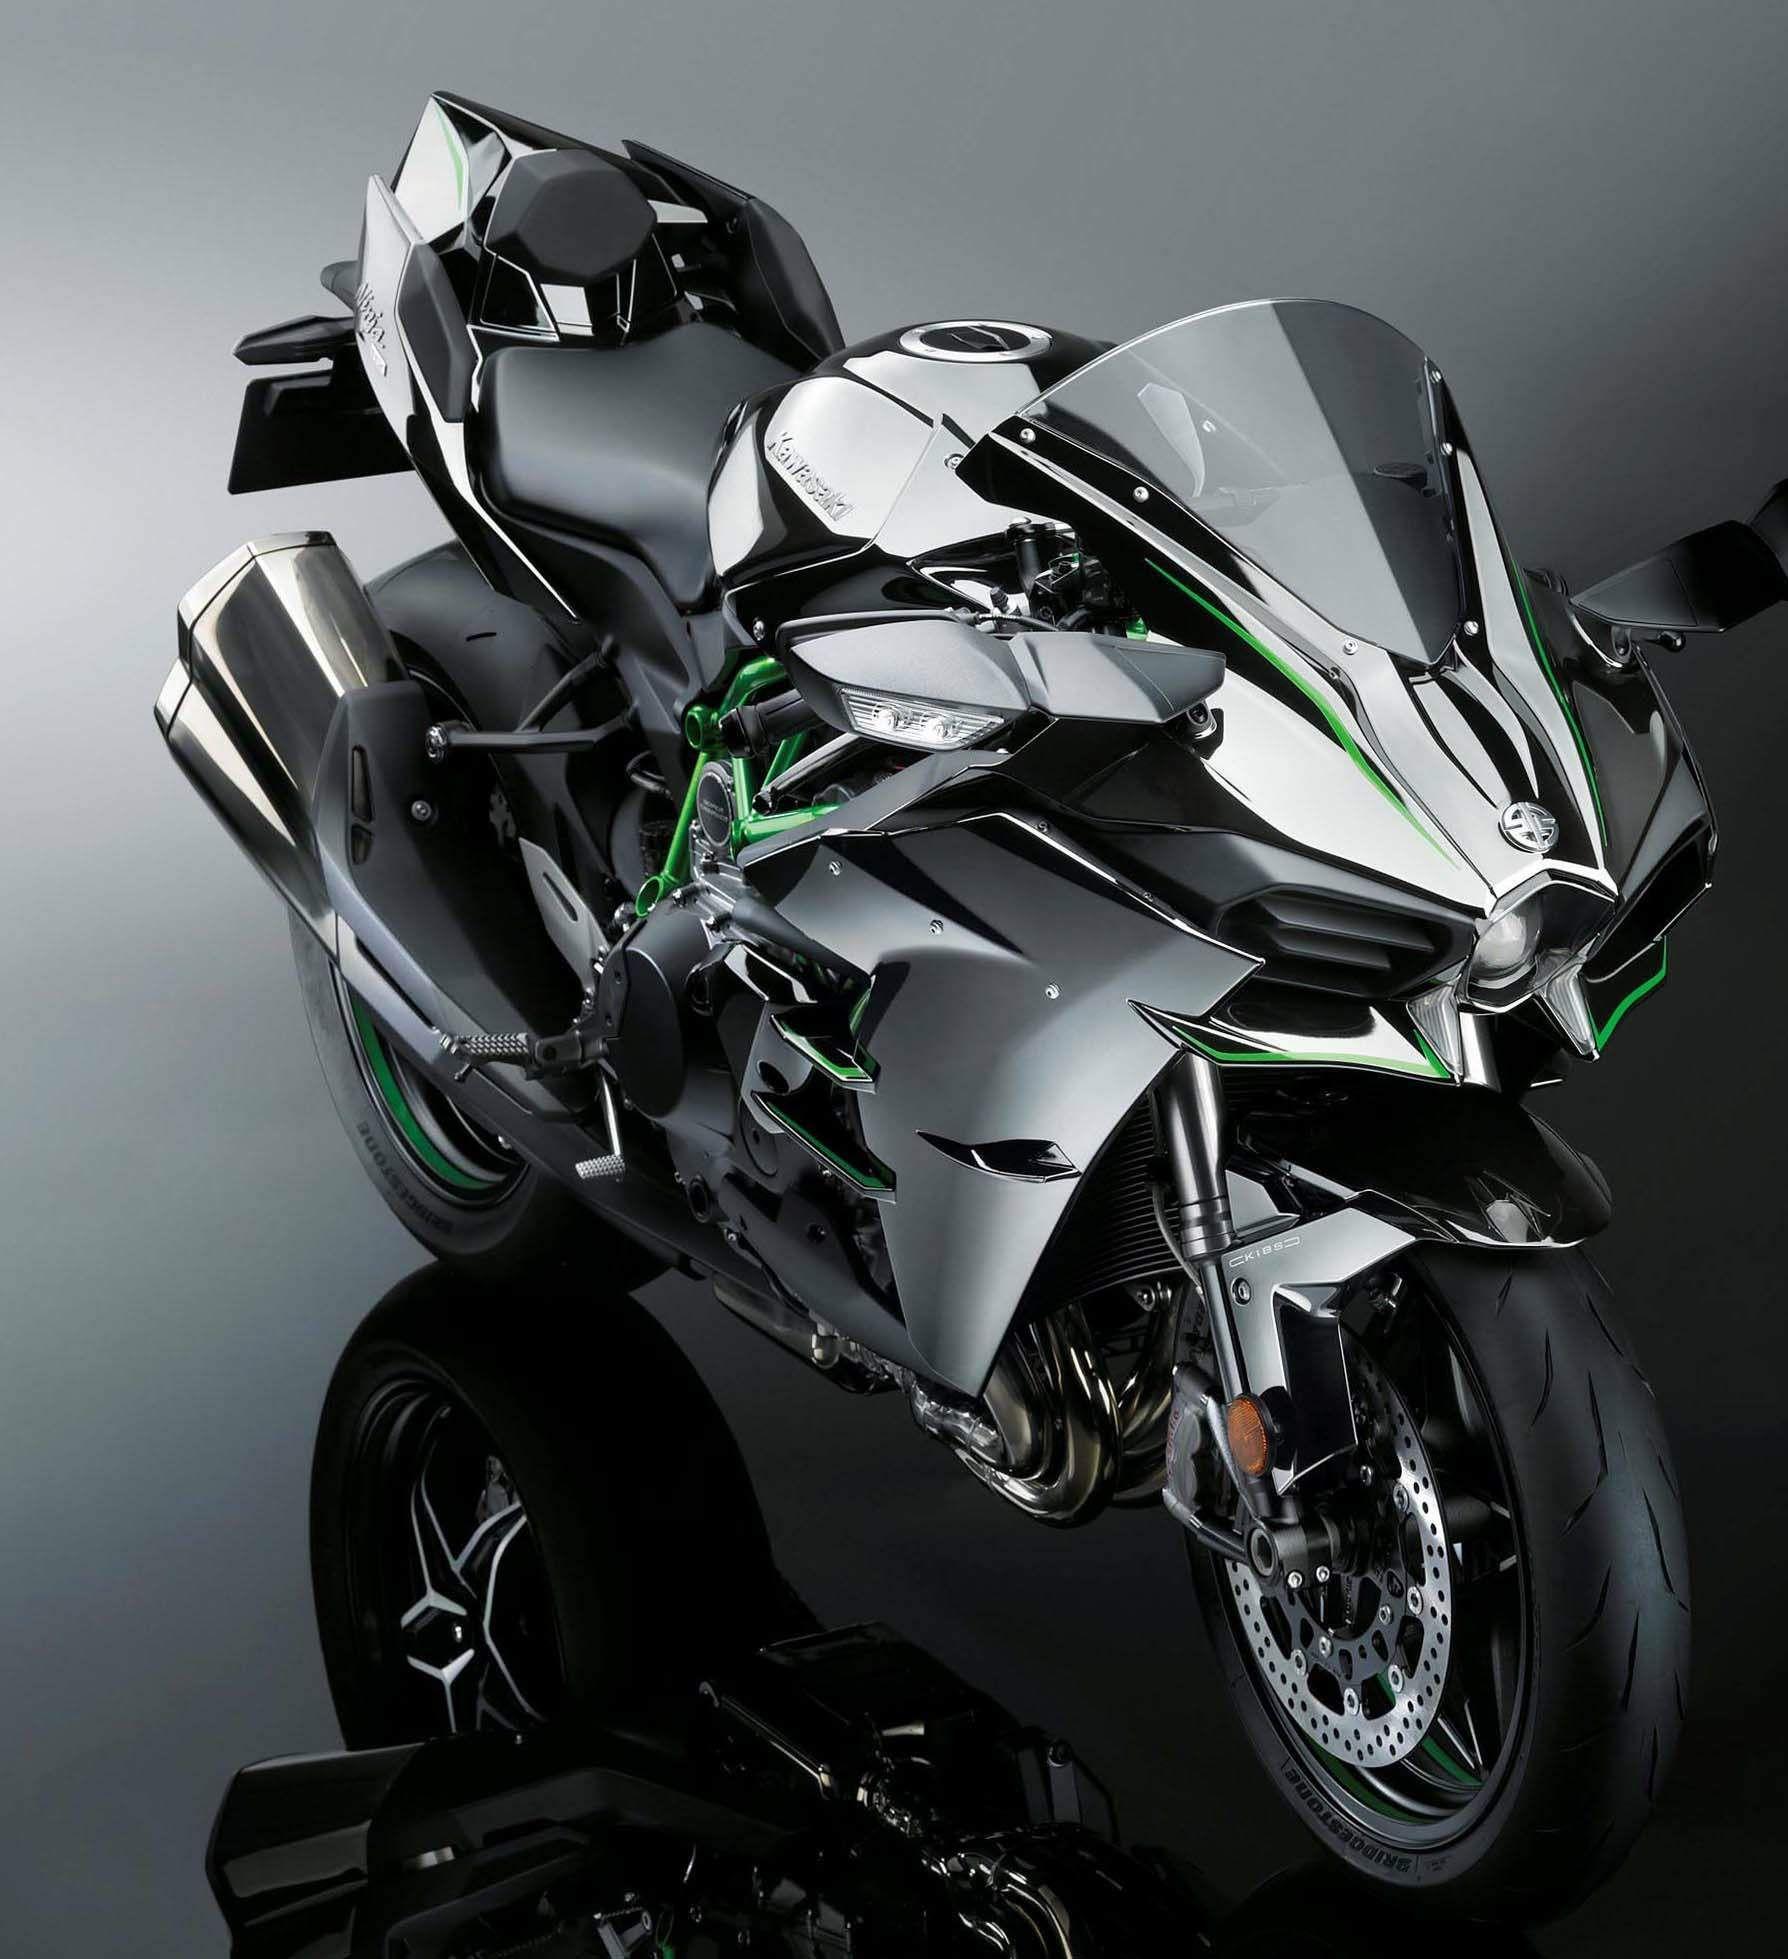 Kawasaki Ninja H2 Zx 1000 Gear And Bikes Pinterest Motos Moto